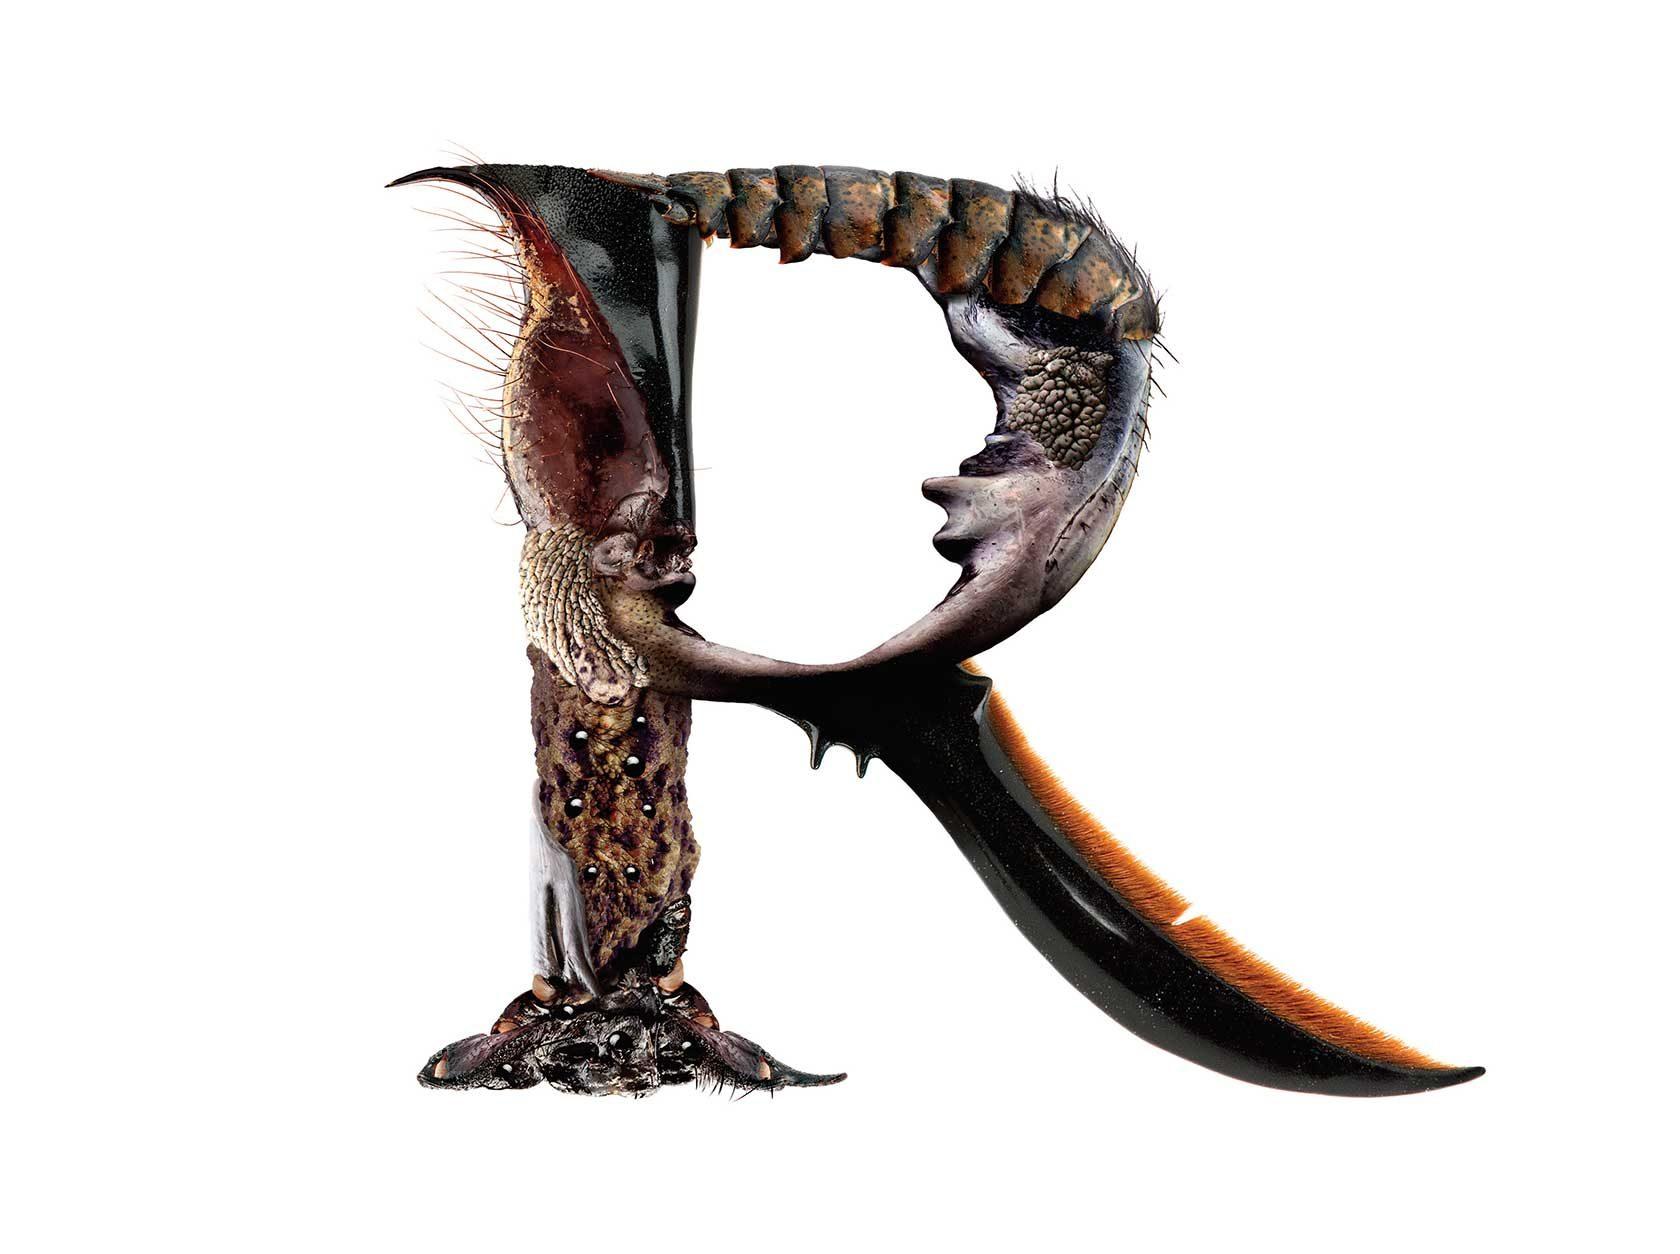 Bird Headed Monster Letter R Design by Furia